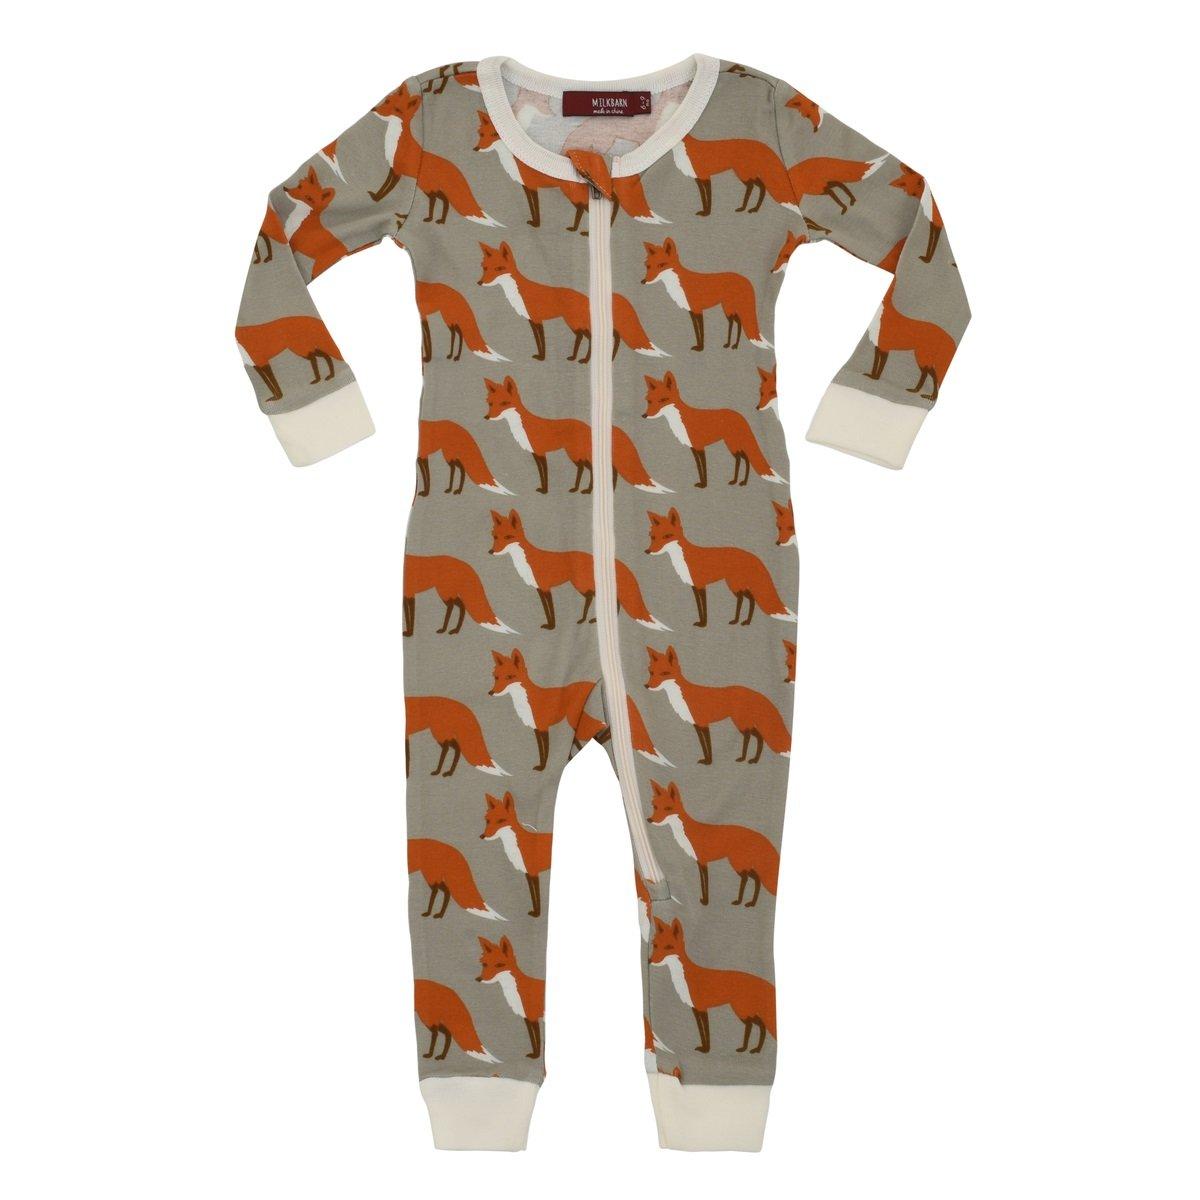 Milkbarn Bamboo Zipper Pajama by MilkBarn